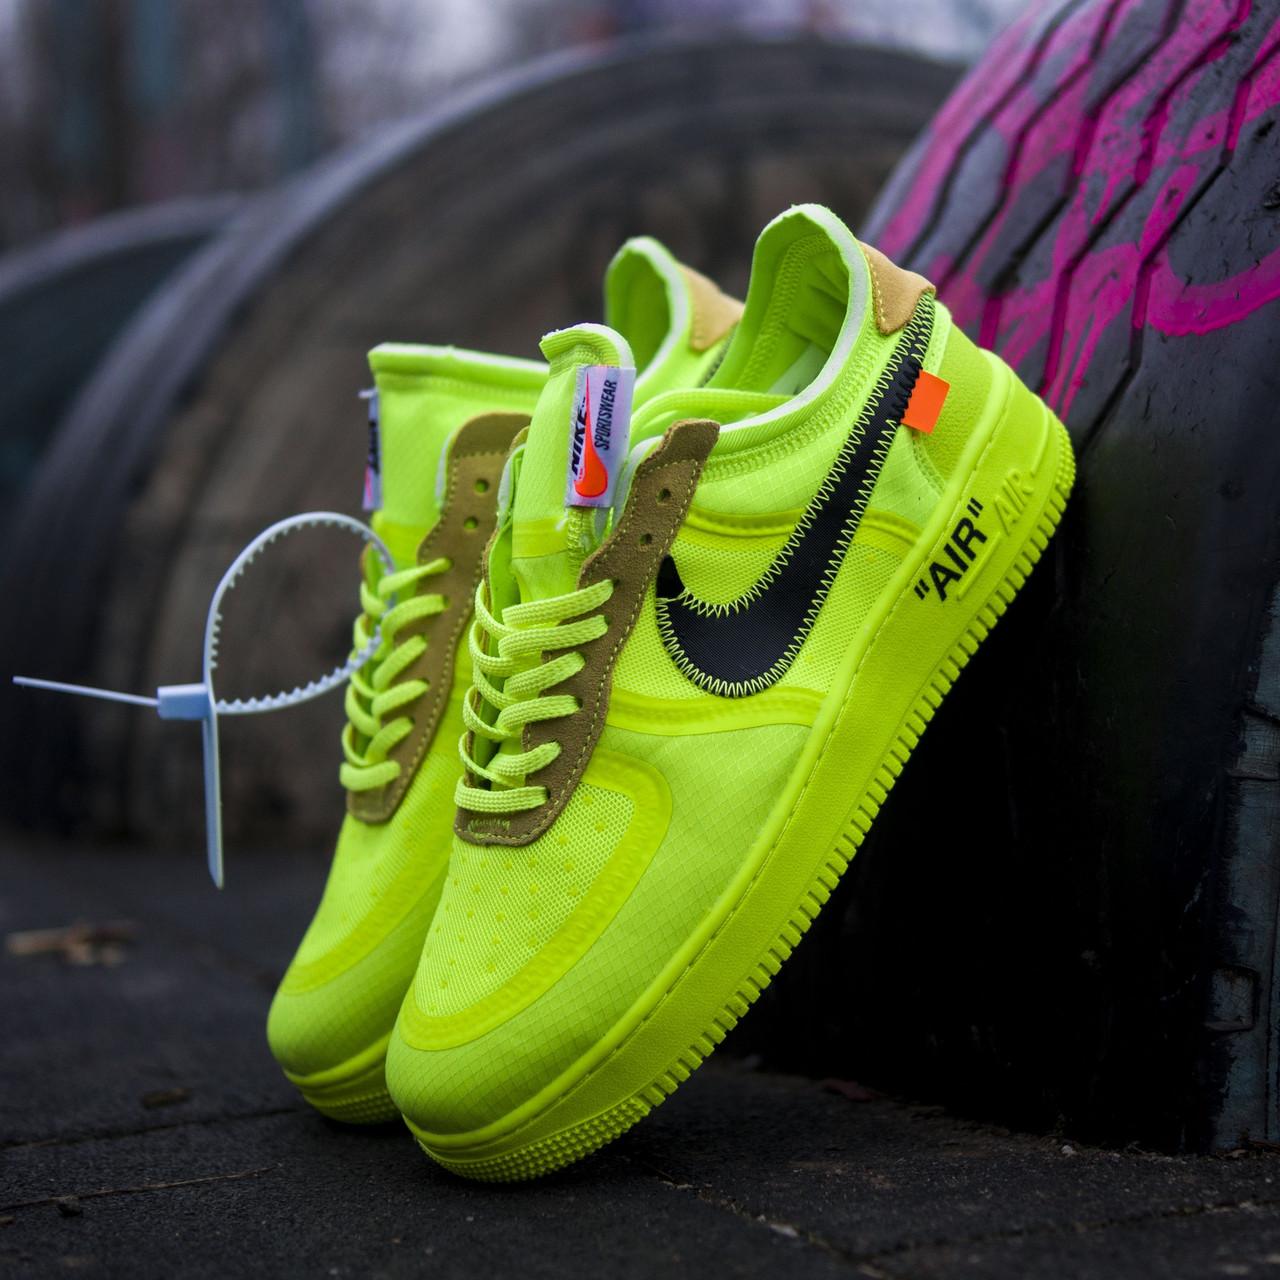 Стильные кроссовки Nike Air Force x Off-White green